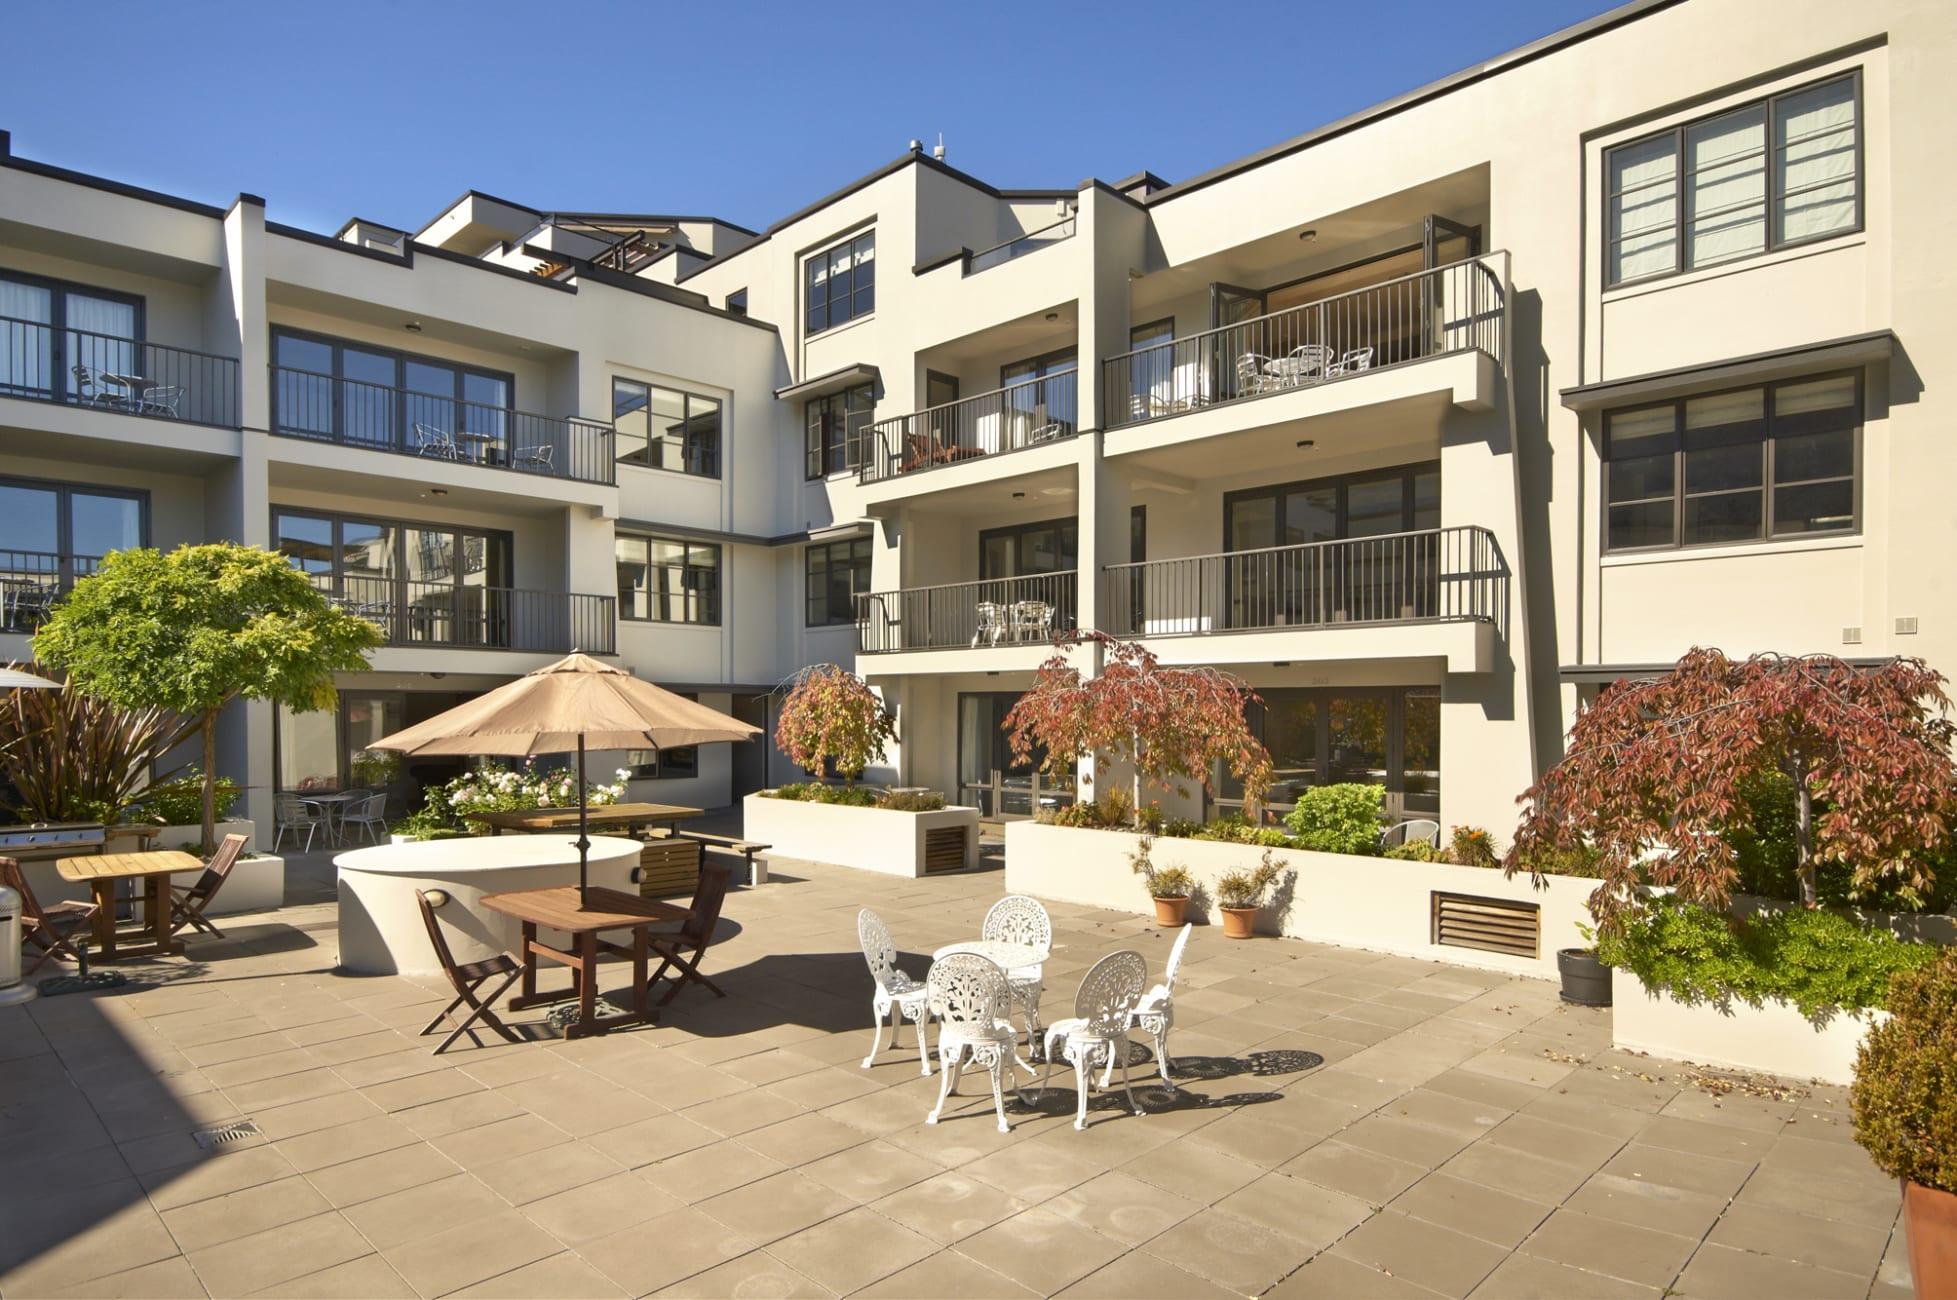 Glebe 2 Beetham Street Queenstown 9300 New Zealand Serviced Apartment